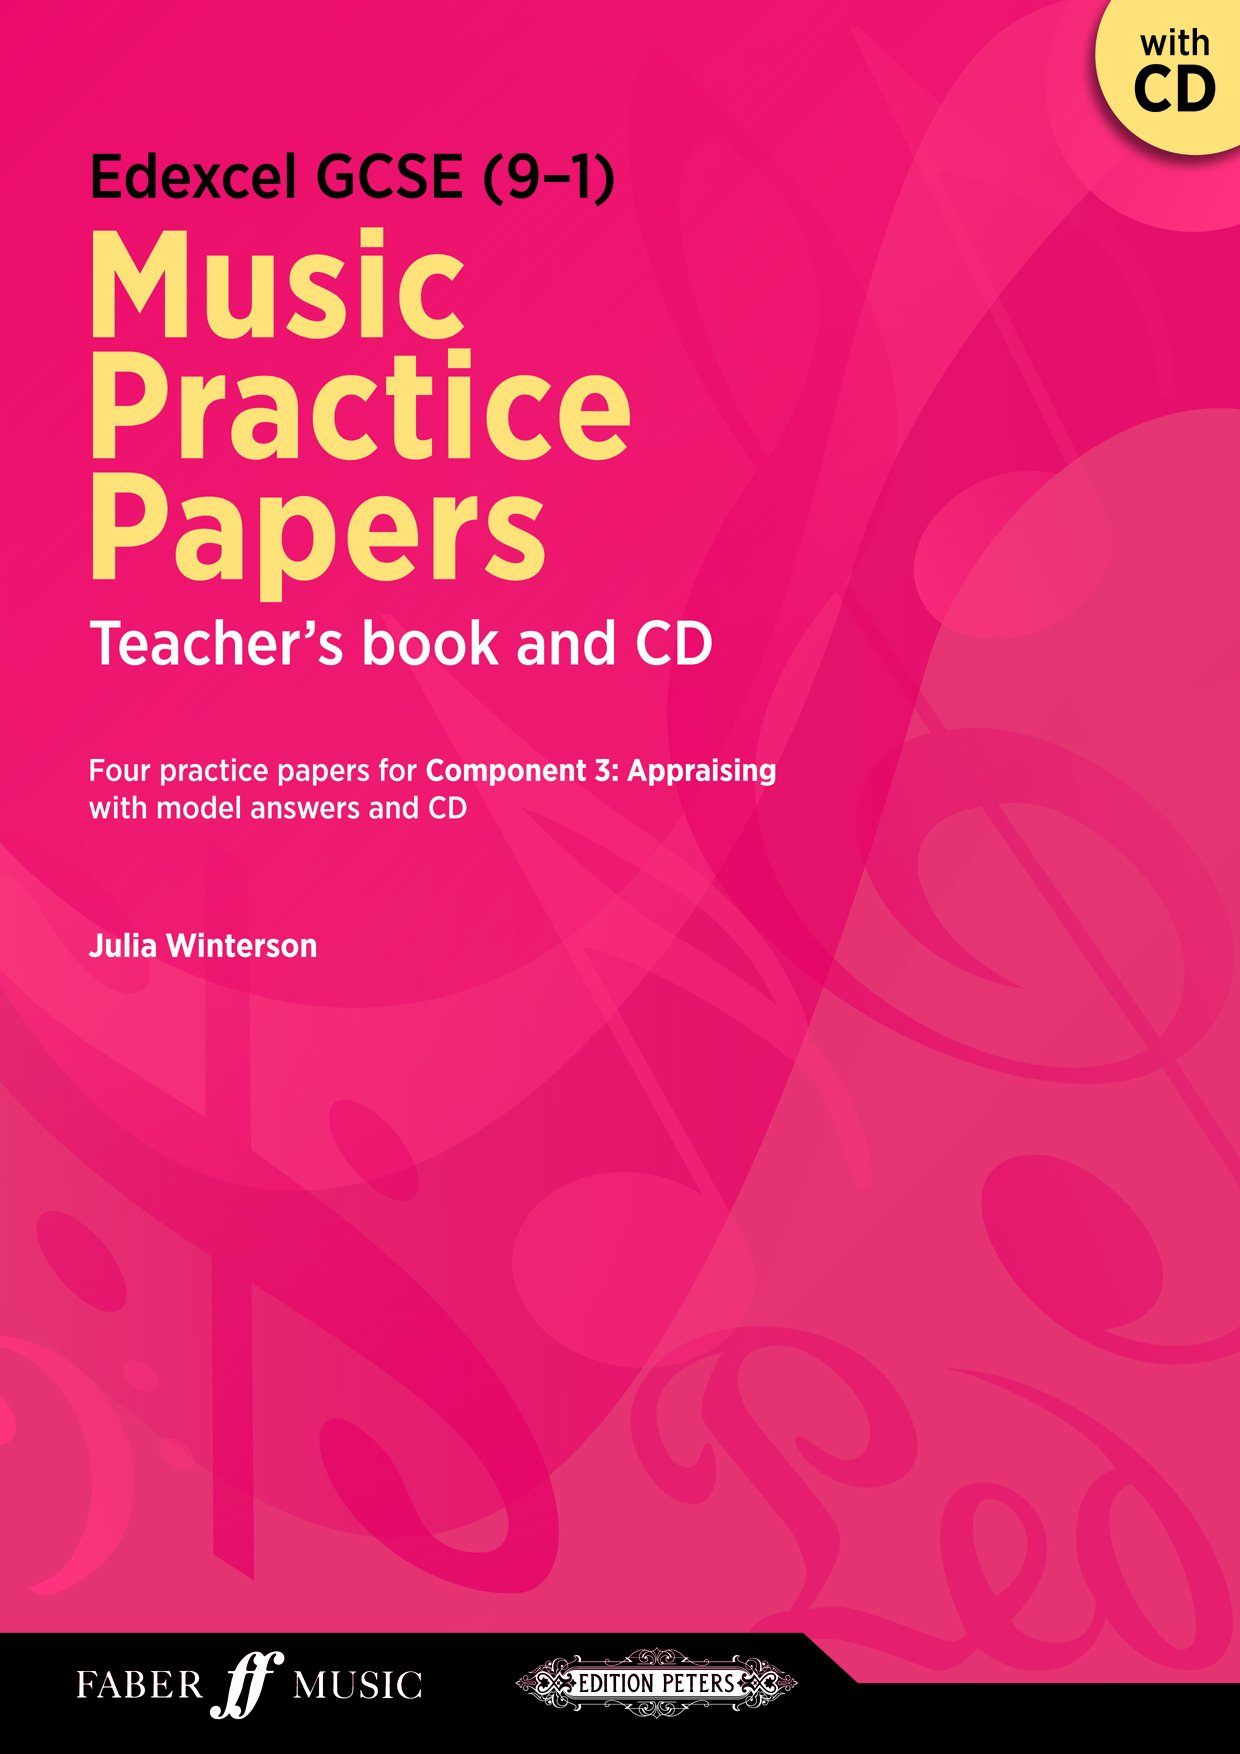 Edexcel GCSE Music Practice Papers Teacher's Book with Free